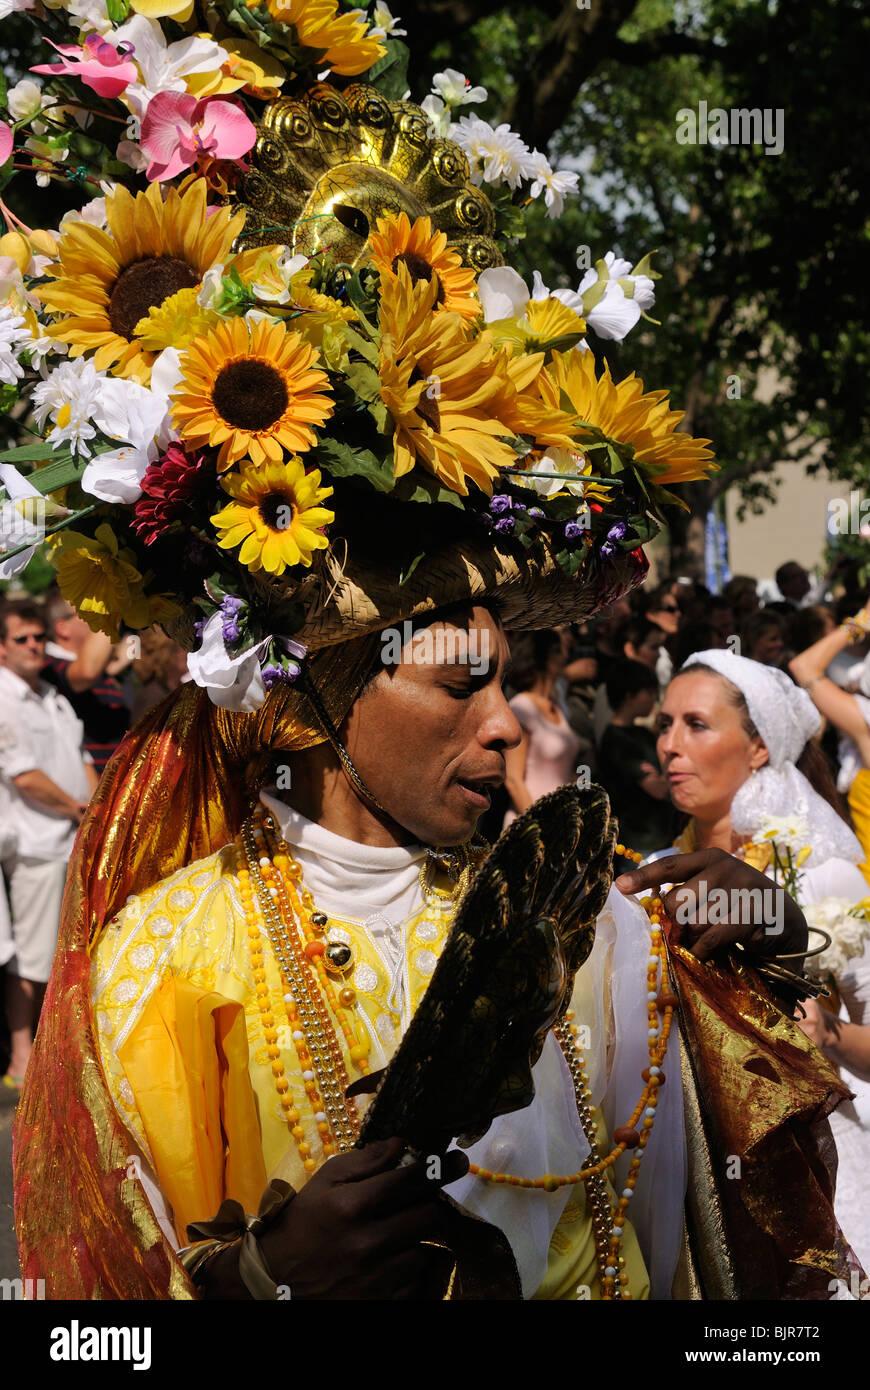 Karneval der Kulturen, el Carnaval de las Culturas, Berlín, distrito Kreuzberg, Alemania, Europa Imagen De Stock